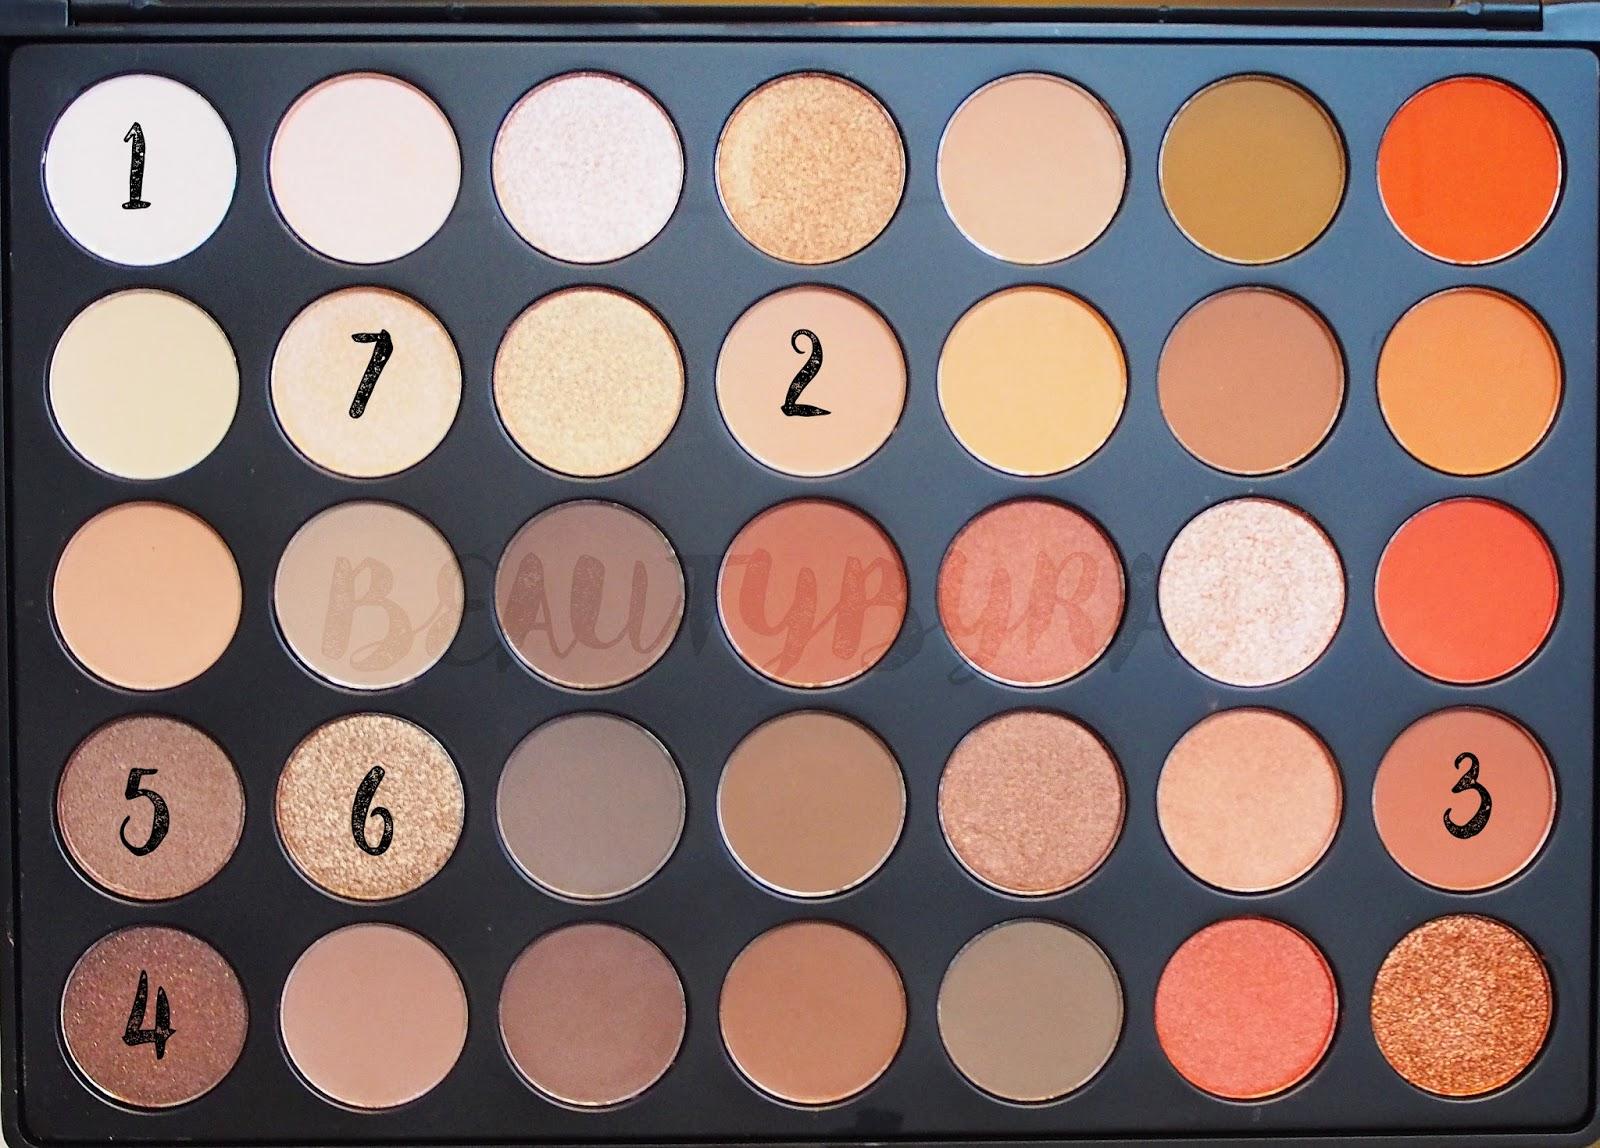 Morphe Brushes 35O Eyeshadow Palette Makeup Tutorial